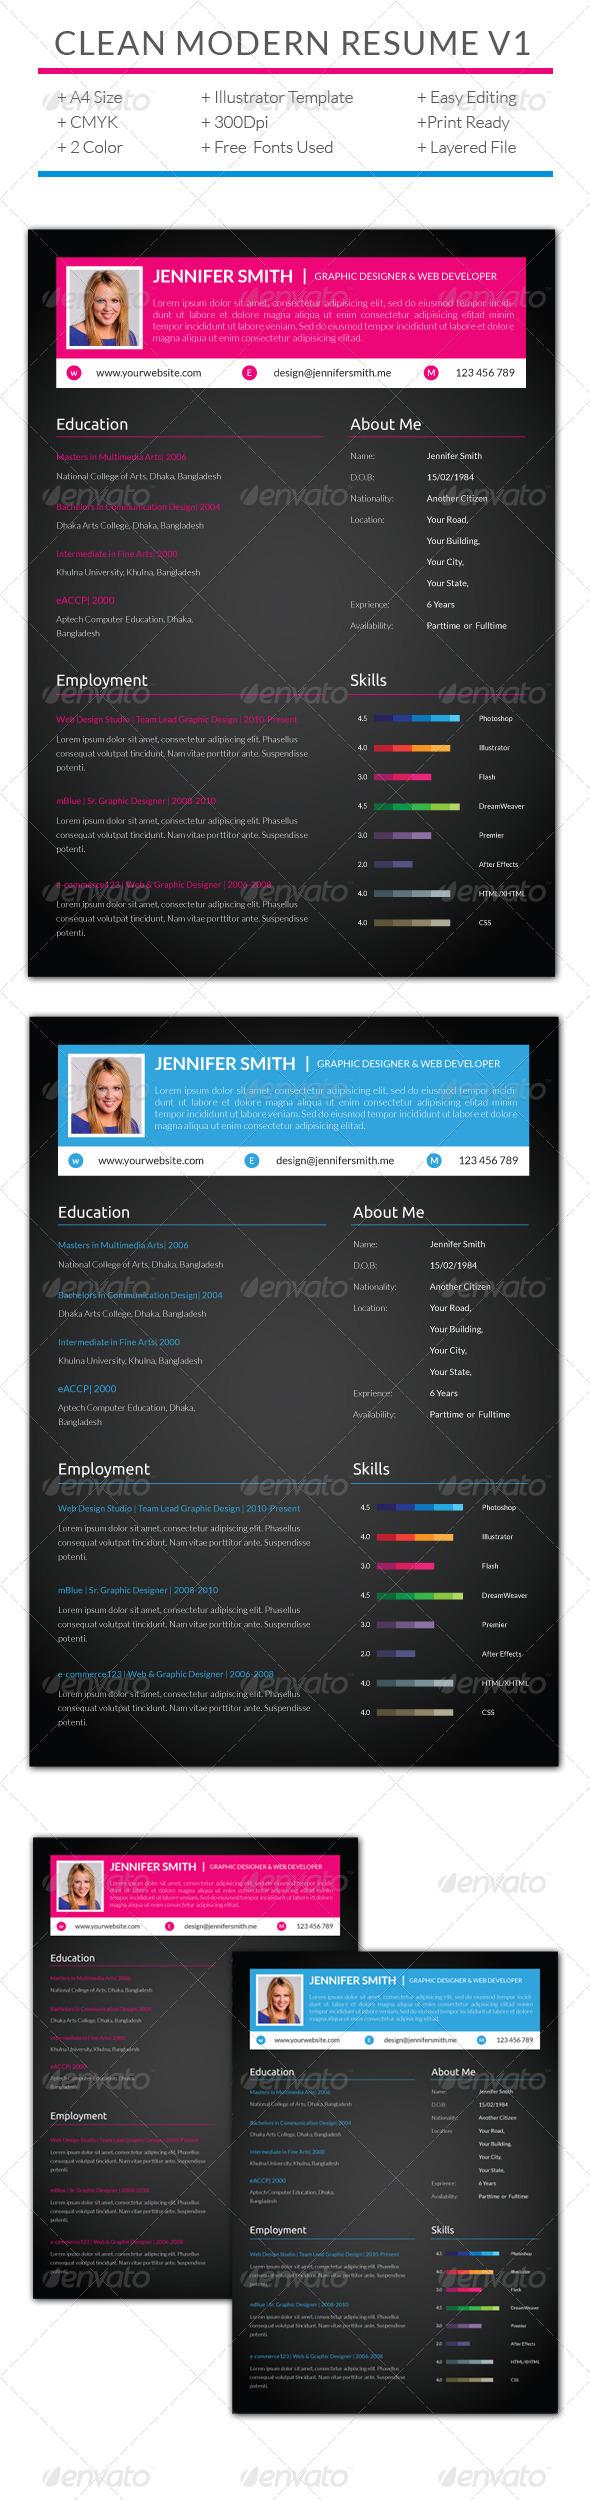 GraphicRiver Clean Modern Resume V1 7592599